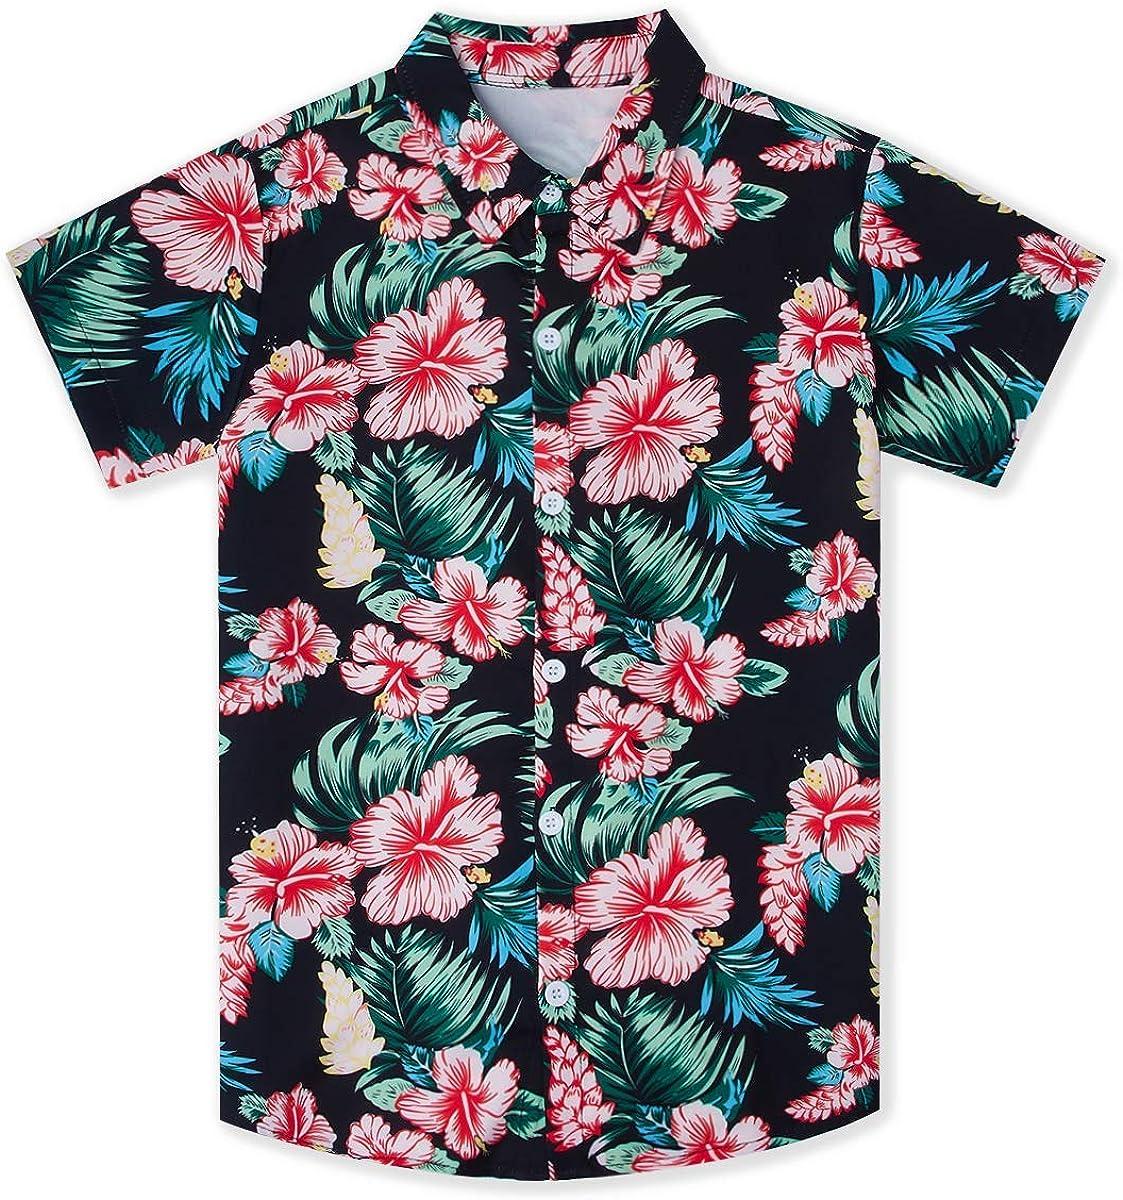 UNICOMIDEA Little & Big Boys 3D Print Hawaiian Shirt Aloha Button Down Dress Shirt for 2-14 Years Old